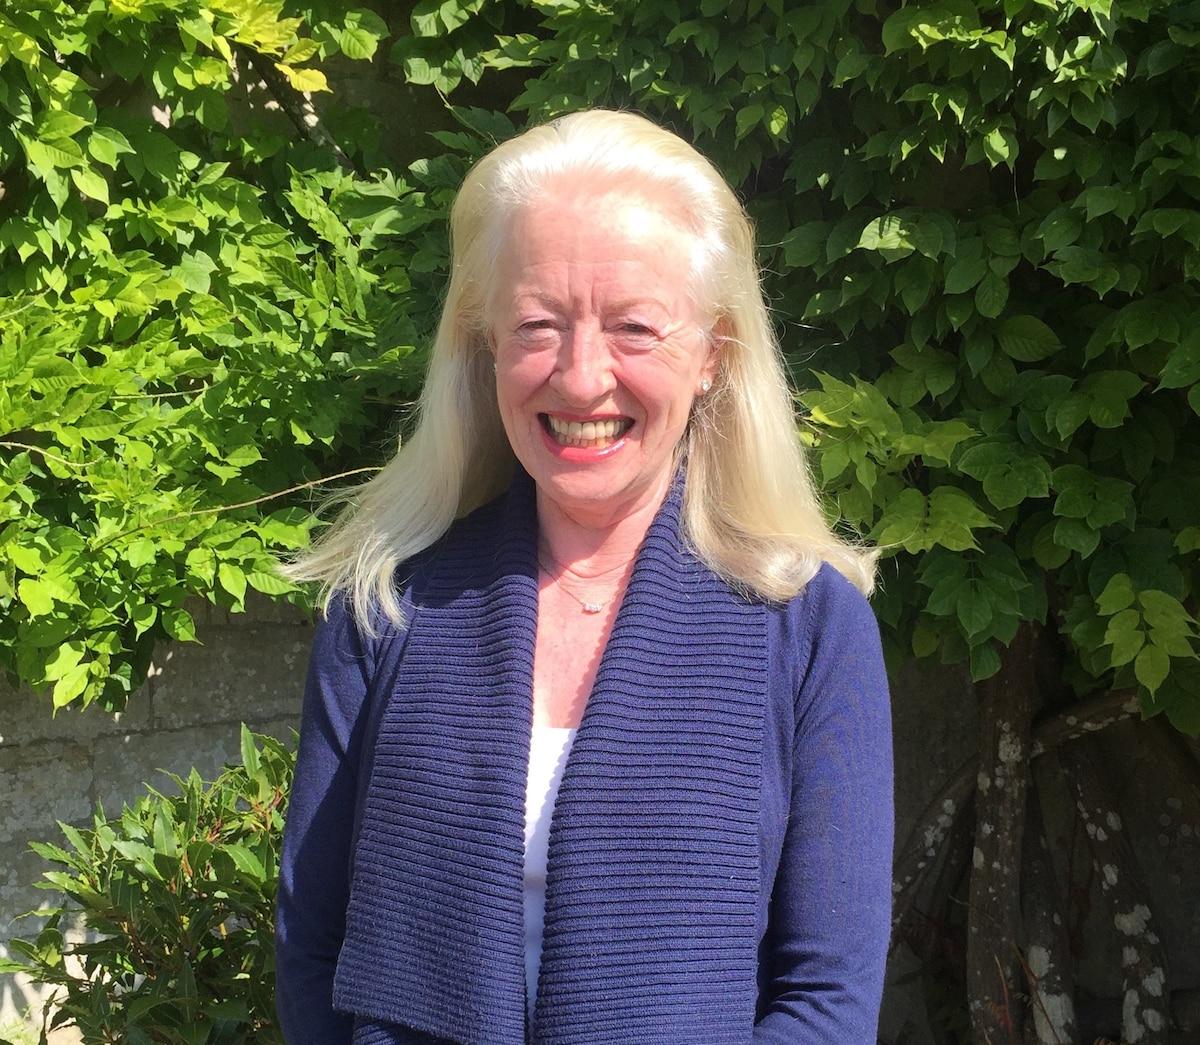 Caroline from Weymouth